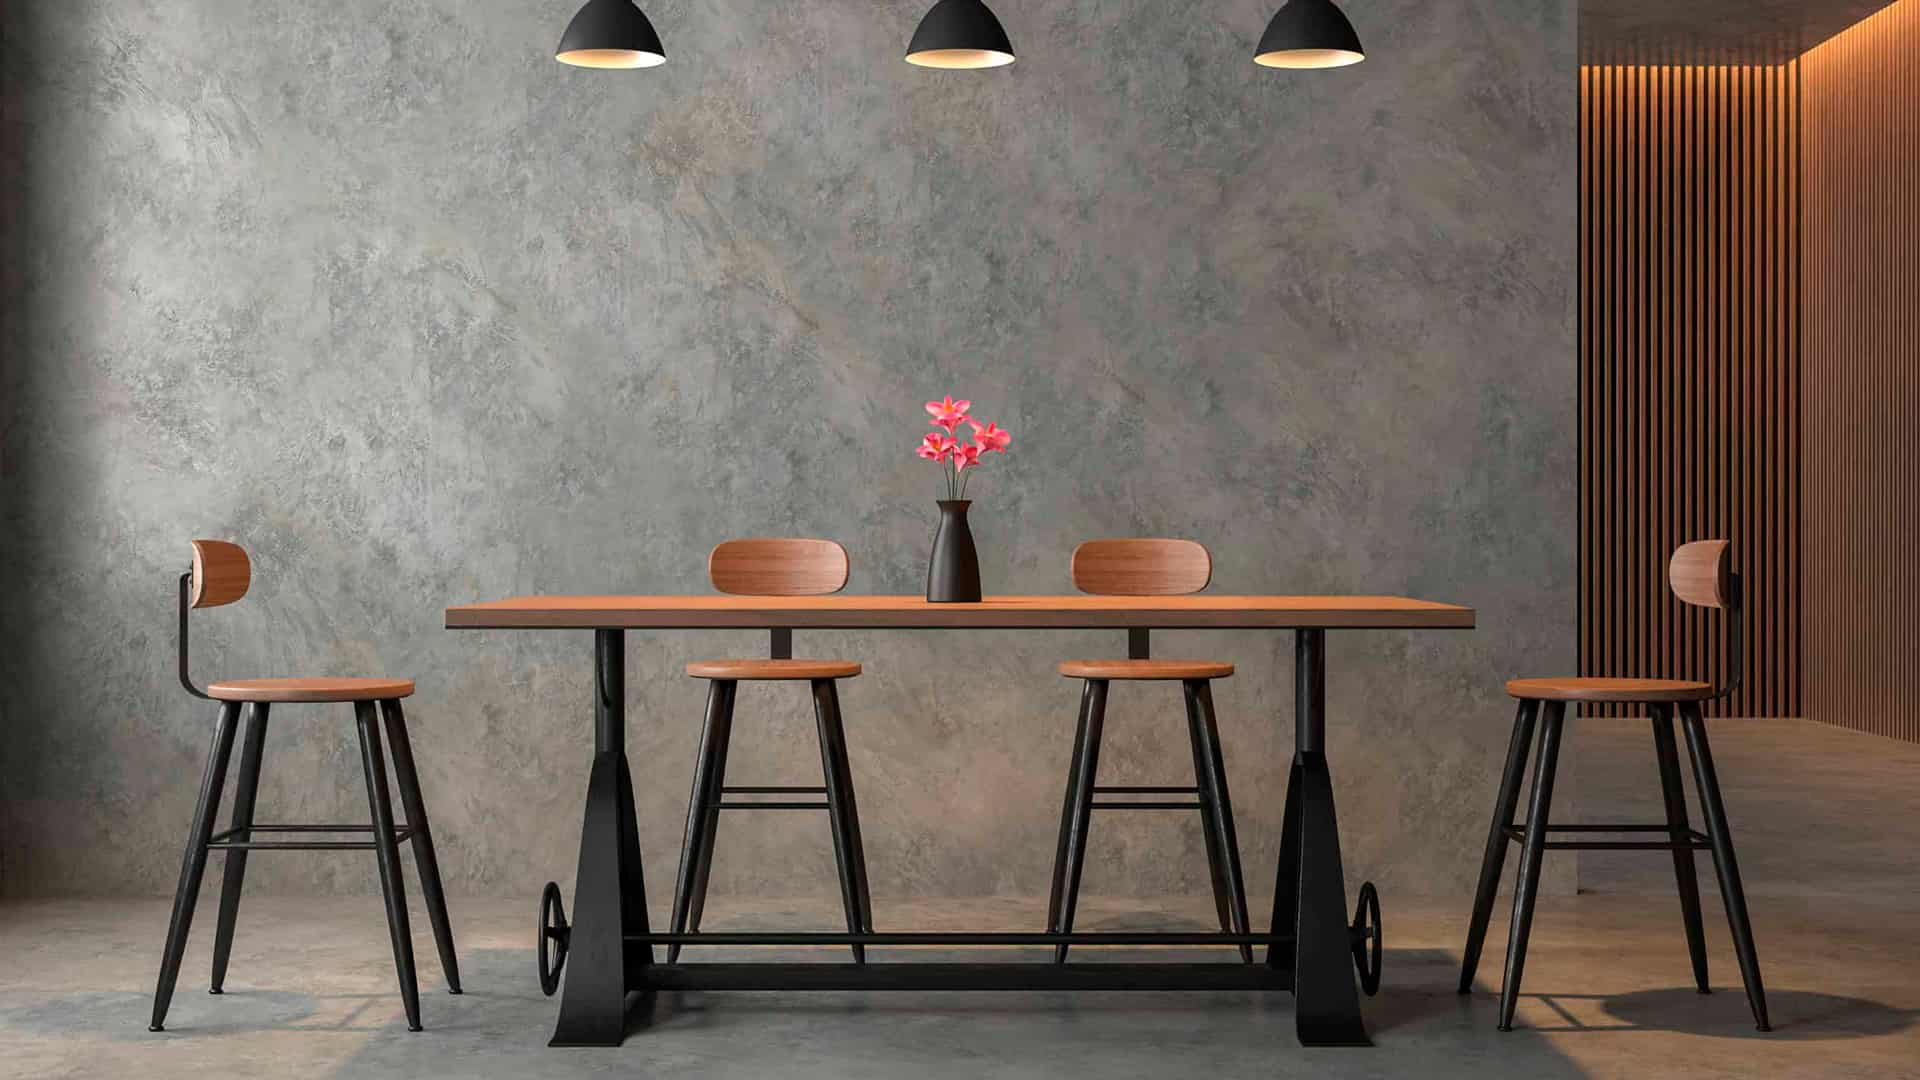 Wood and Metal Furniture